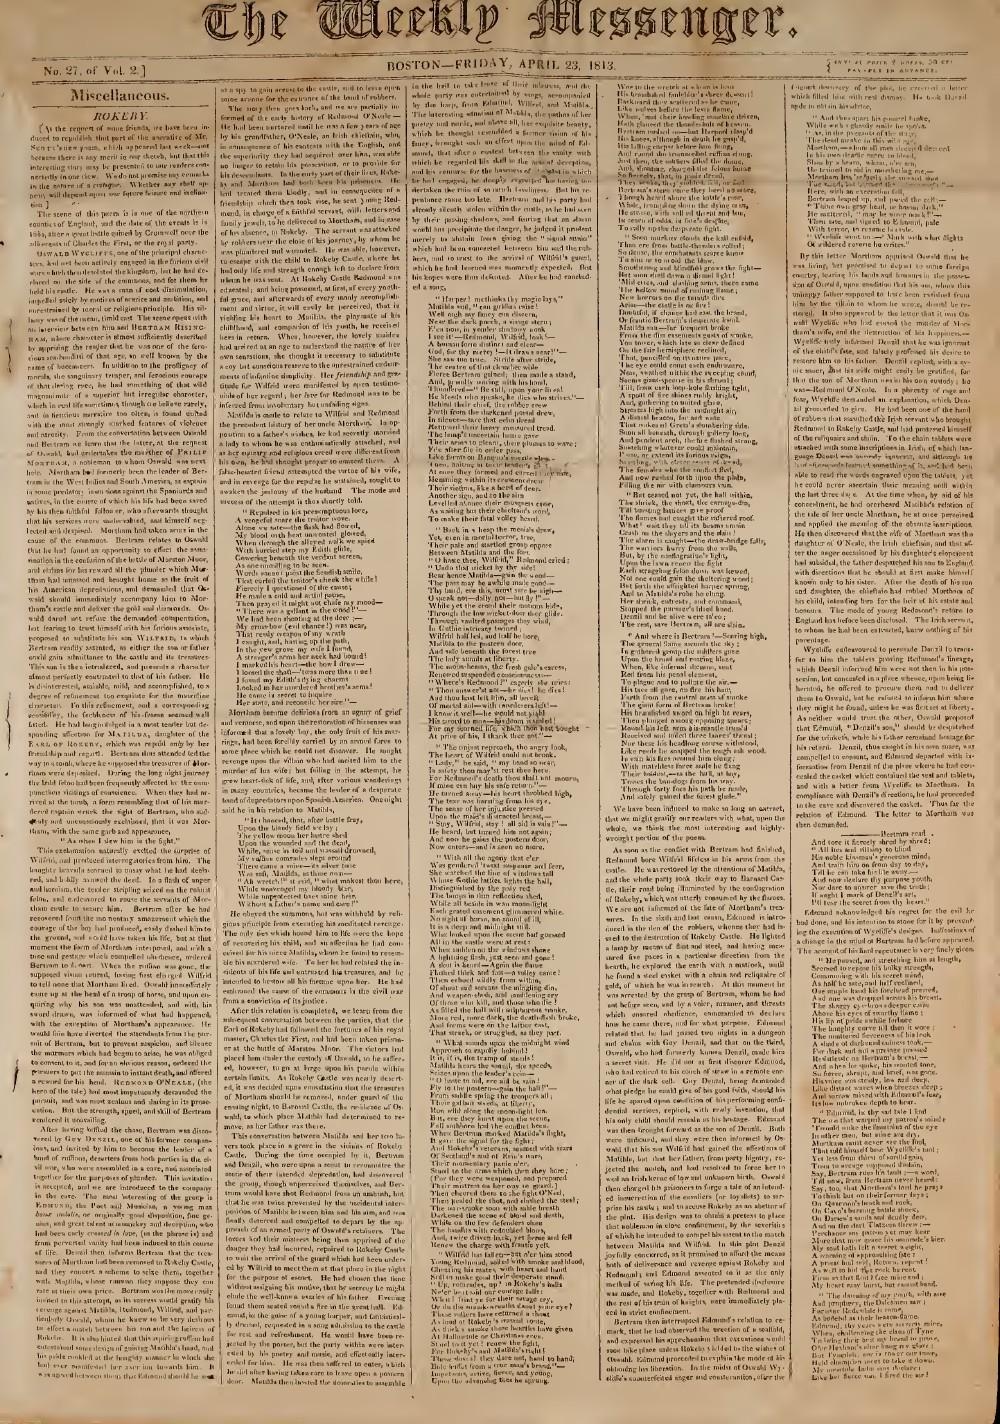 The Weekly Messenger, 23 April 1813 (vol. 2, no. 27)